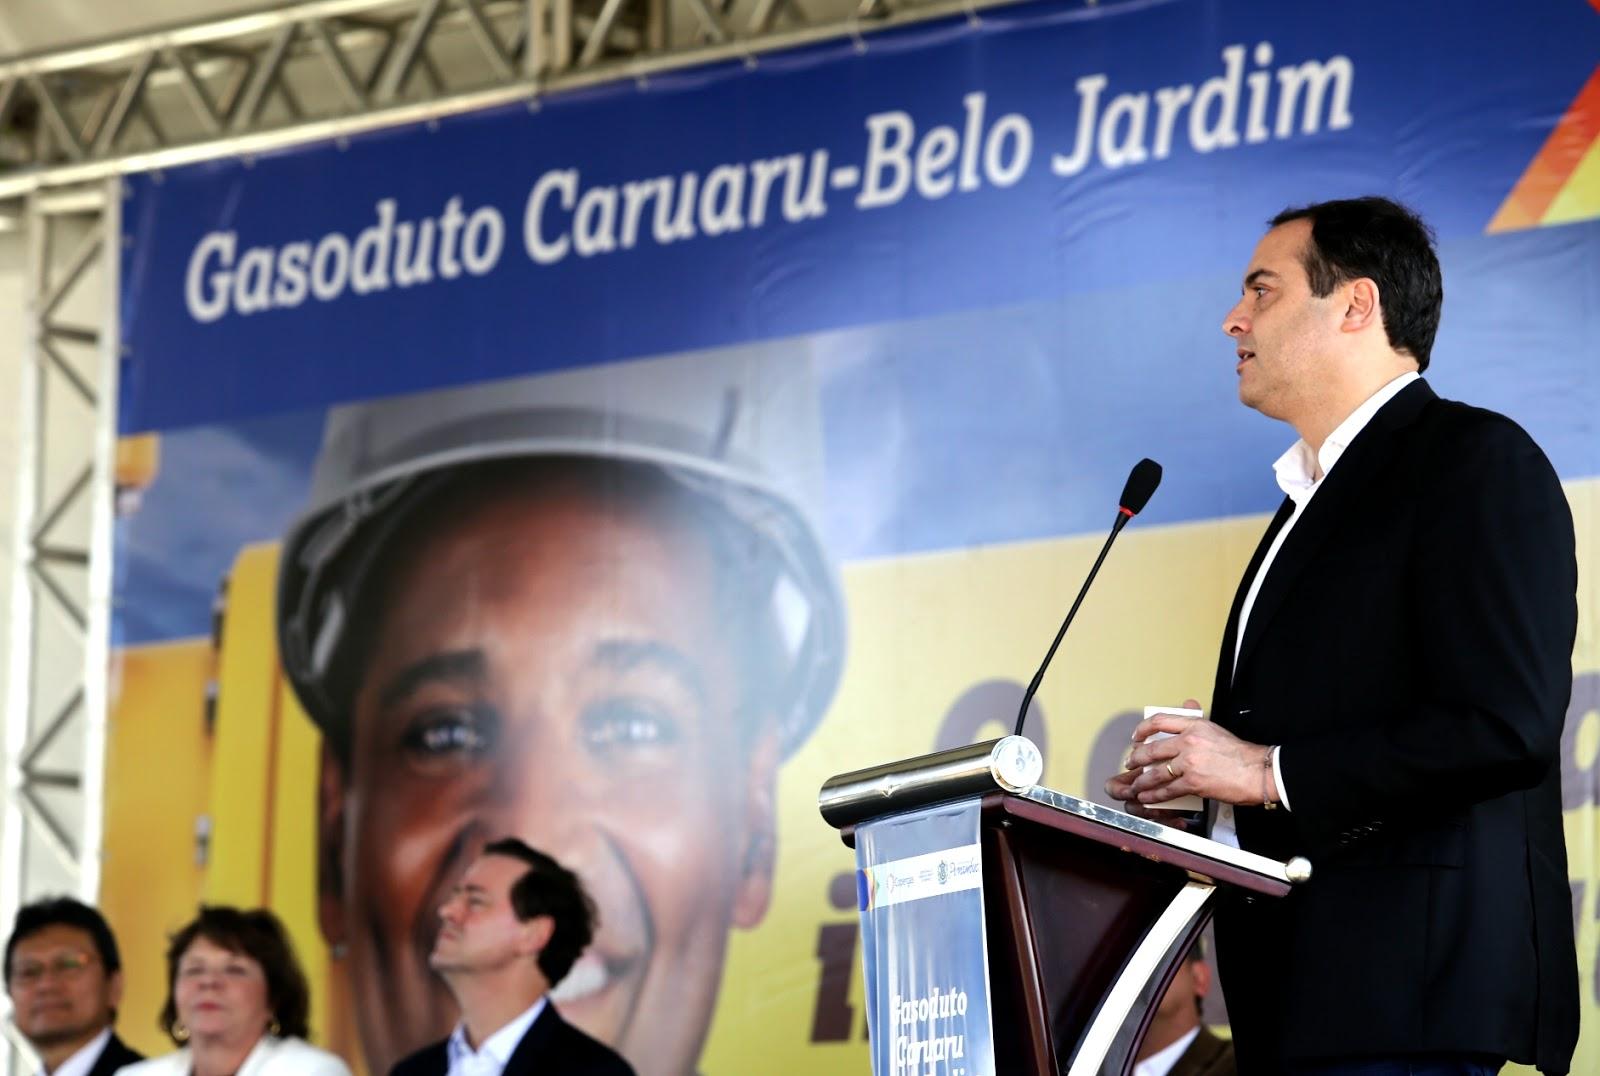 Resultado de imagem para Governador entrega gasoduto Caruaru-Belo Jardim